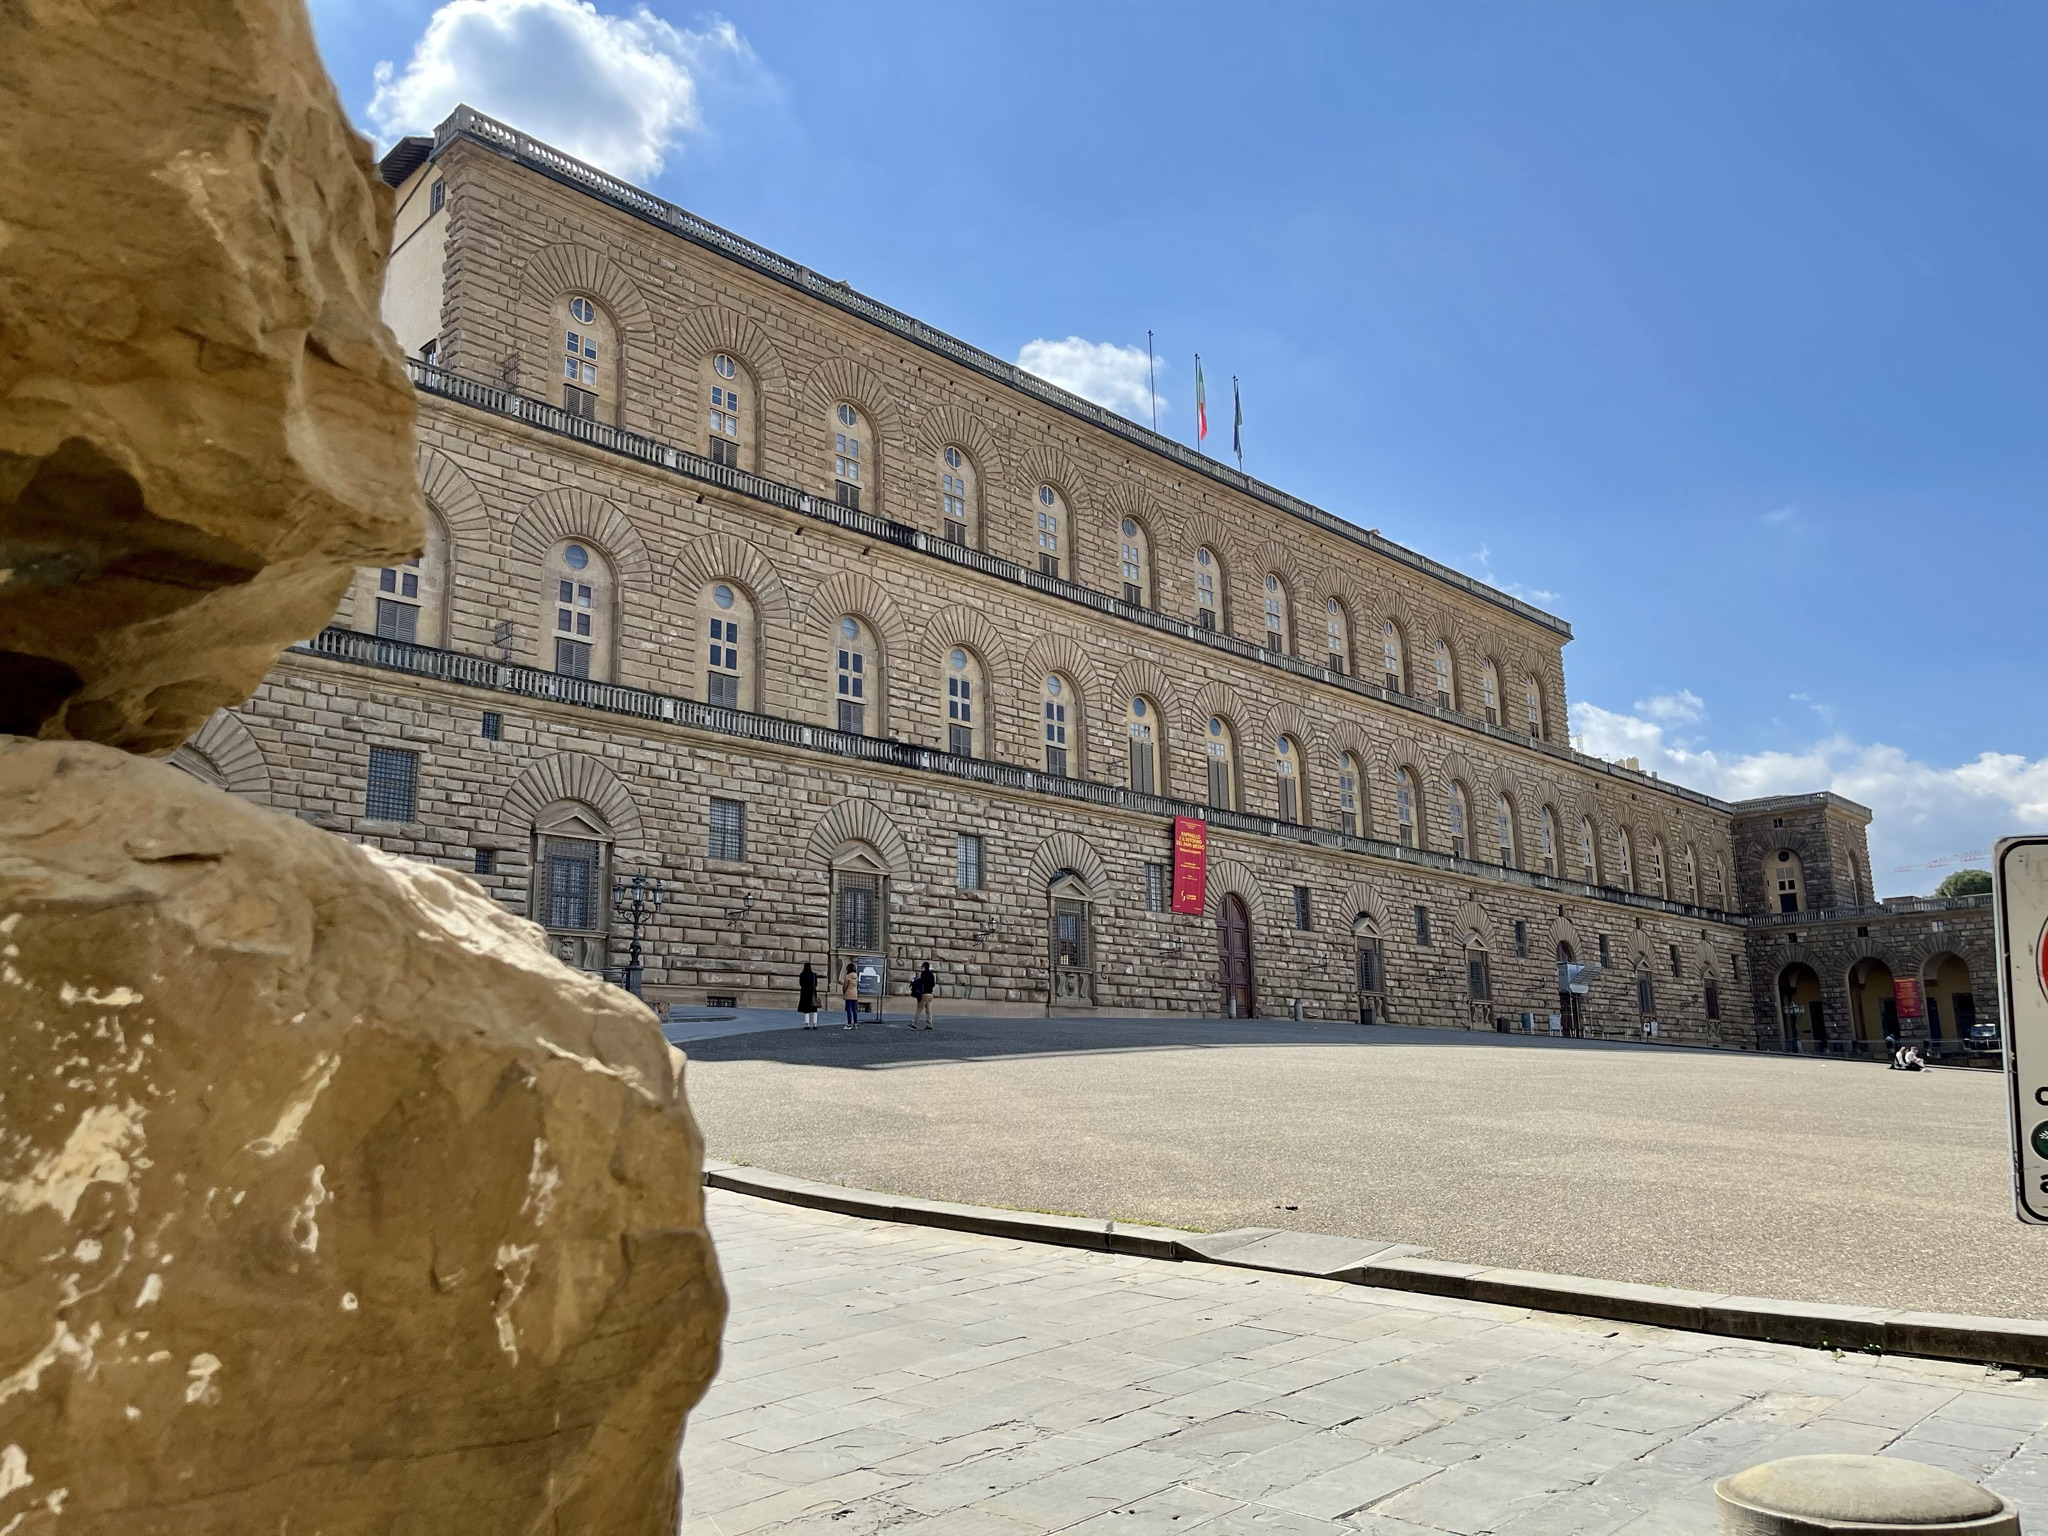 I musei di Palazzo Pitti